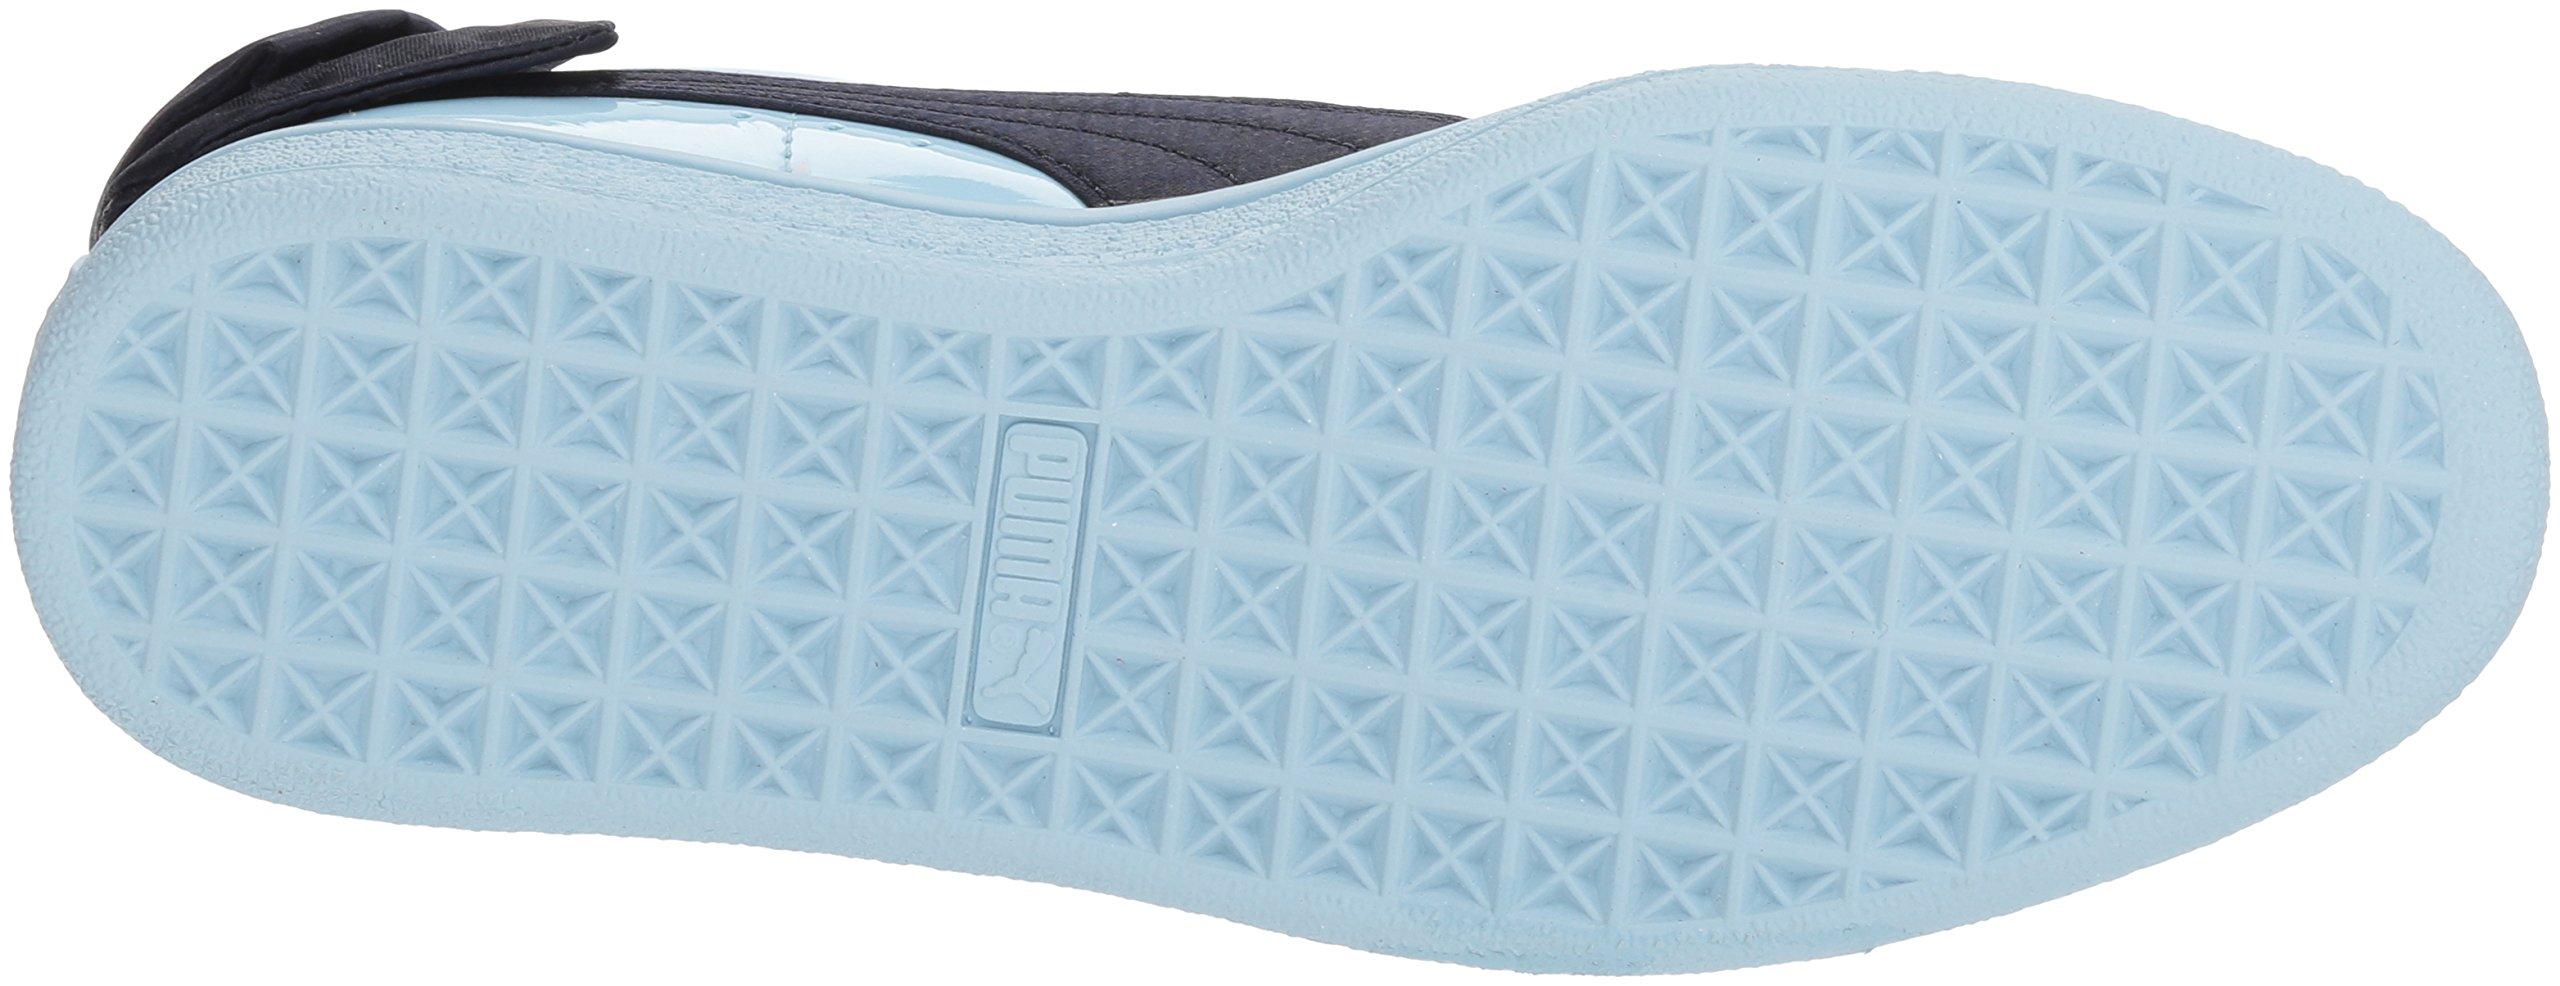 PUMA Unisex-Kids Basket Bow Patent Sneaker, Cerulean-Peacoat, 12 M US Little Kid by PUMA (Image #3)